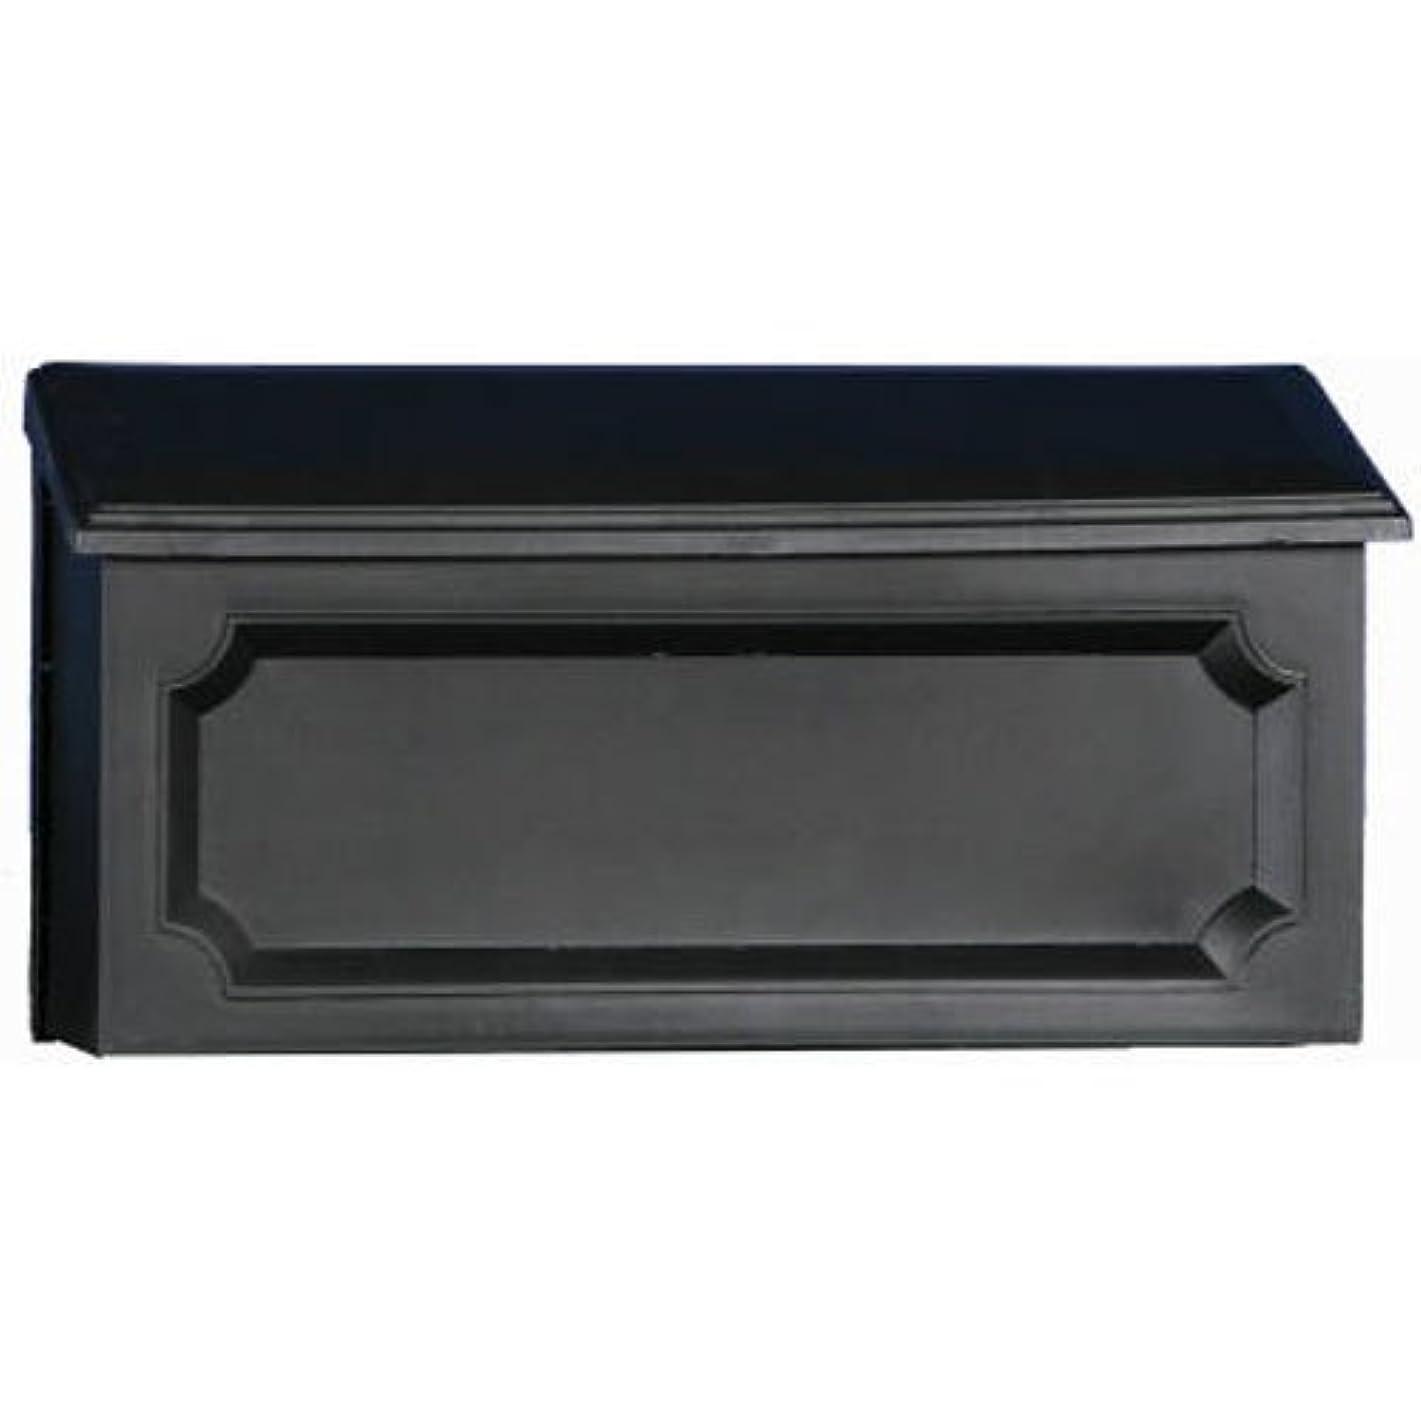 Gibraltar Mailboxes Windsor Medium Capacity Rust-Proof Plastic Black, Wall-Mount Mailbox, WMH00B04